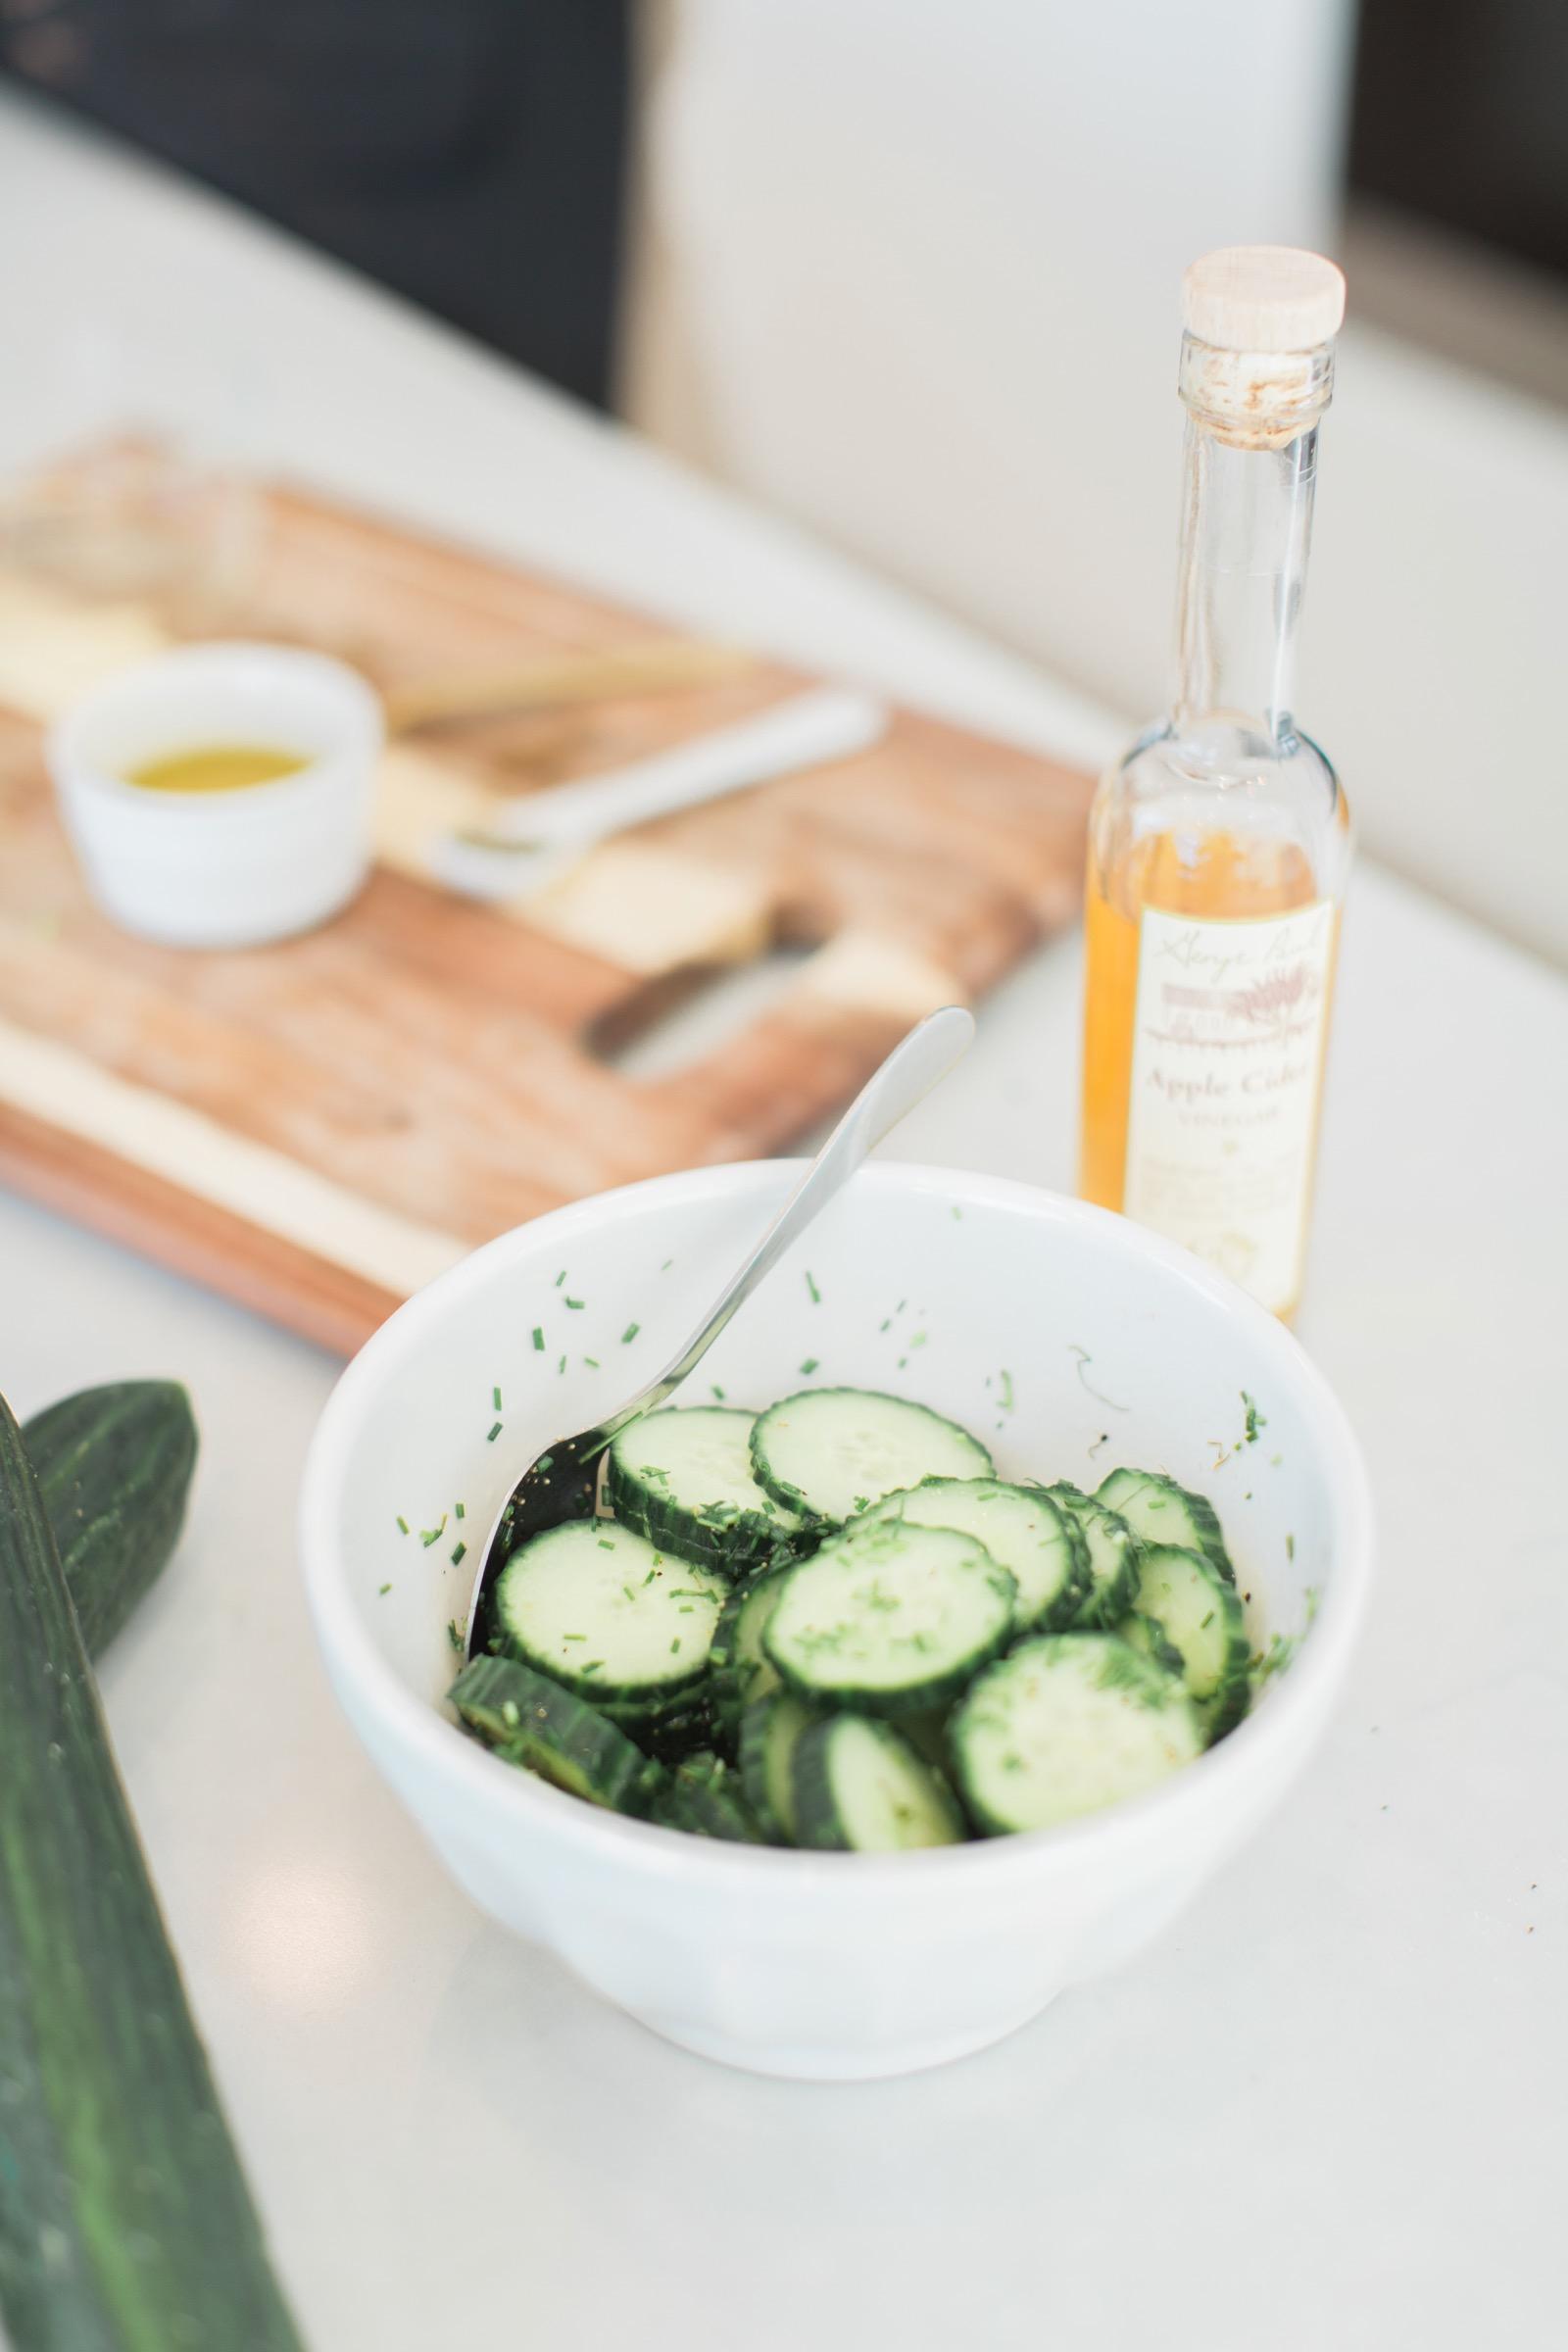 Sweet Apple Cider Vinegar Cucumber Salad Recipe